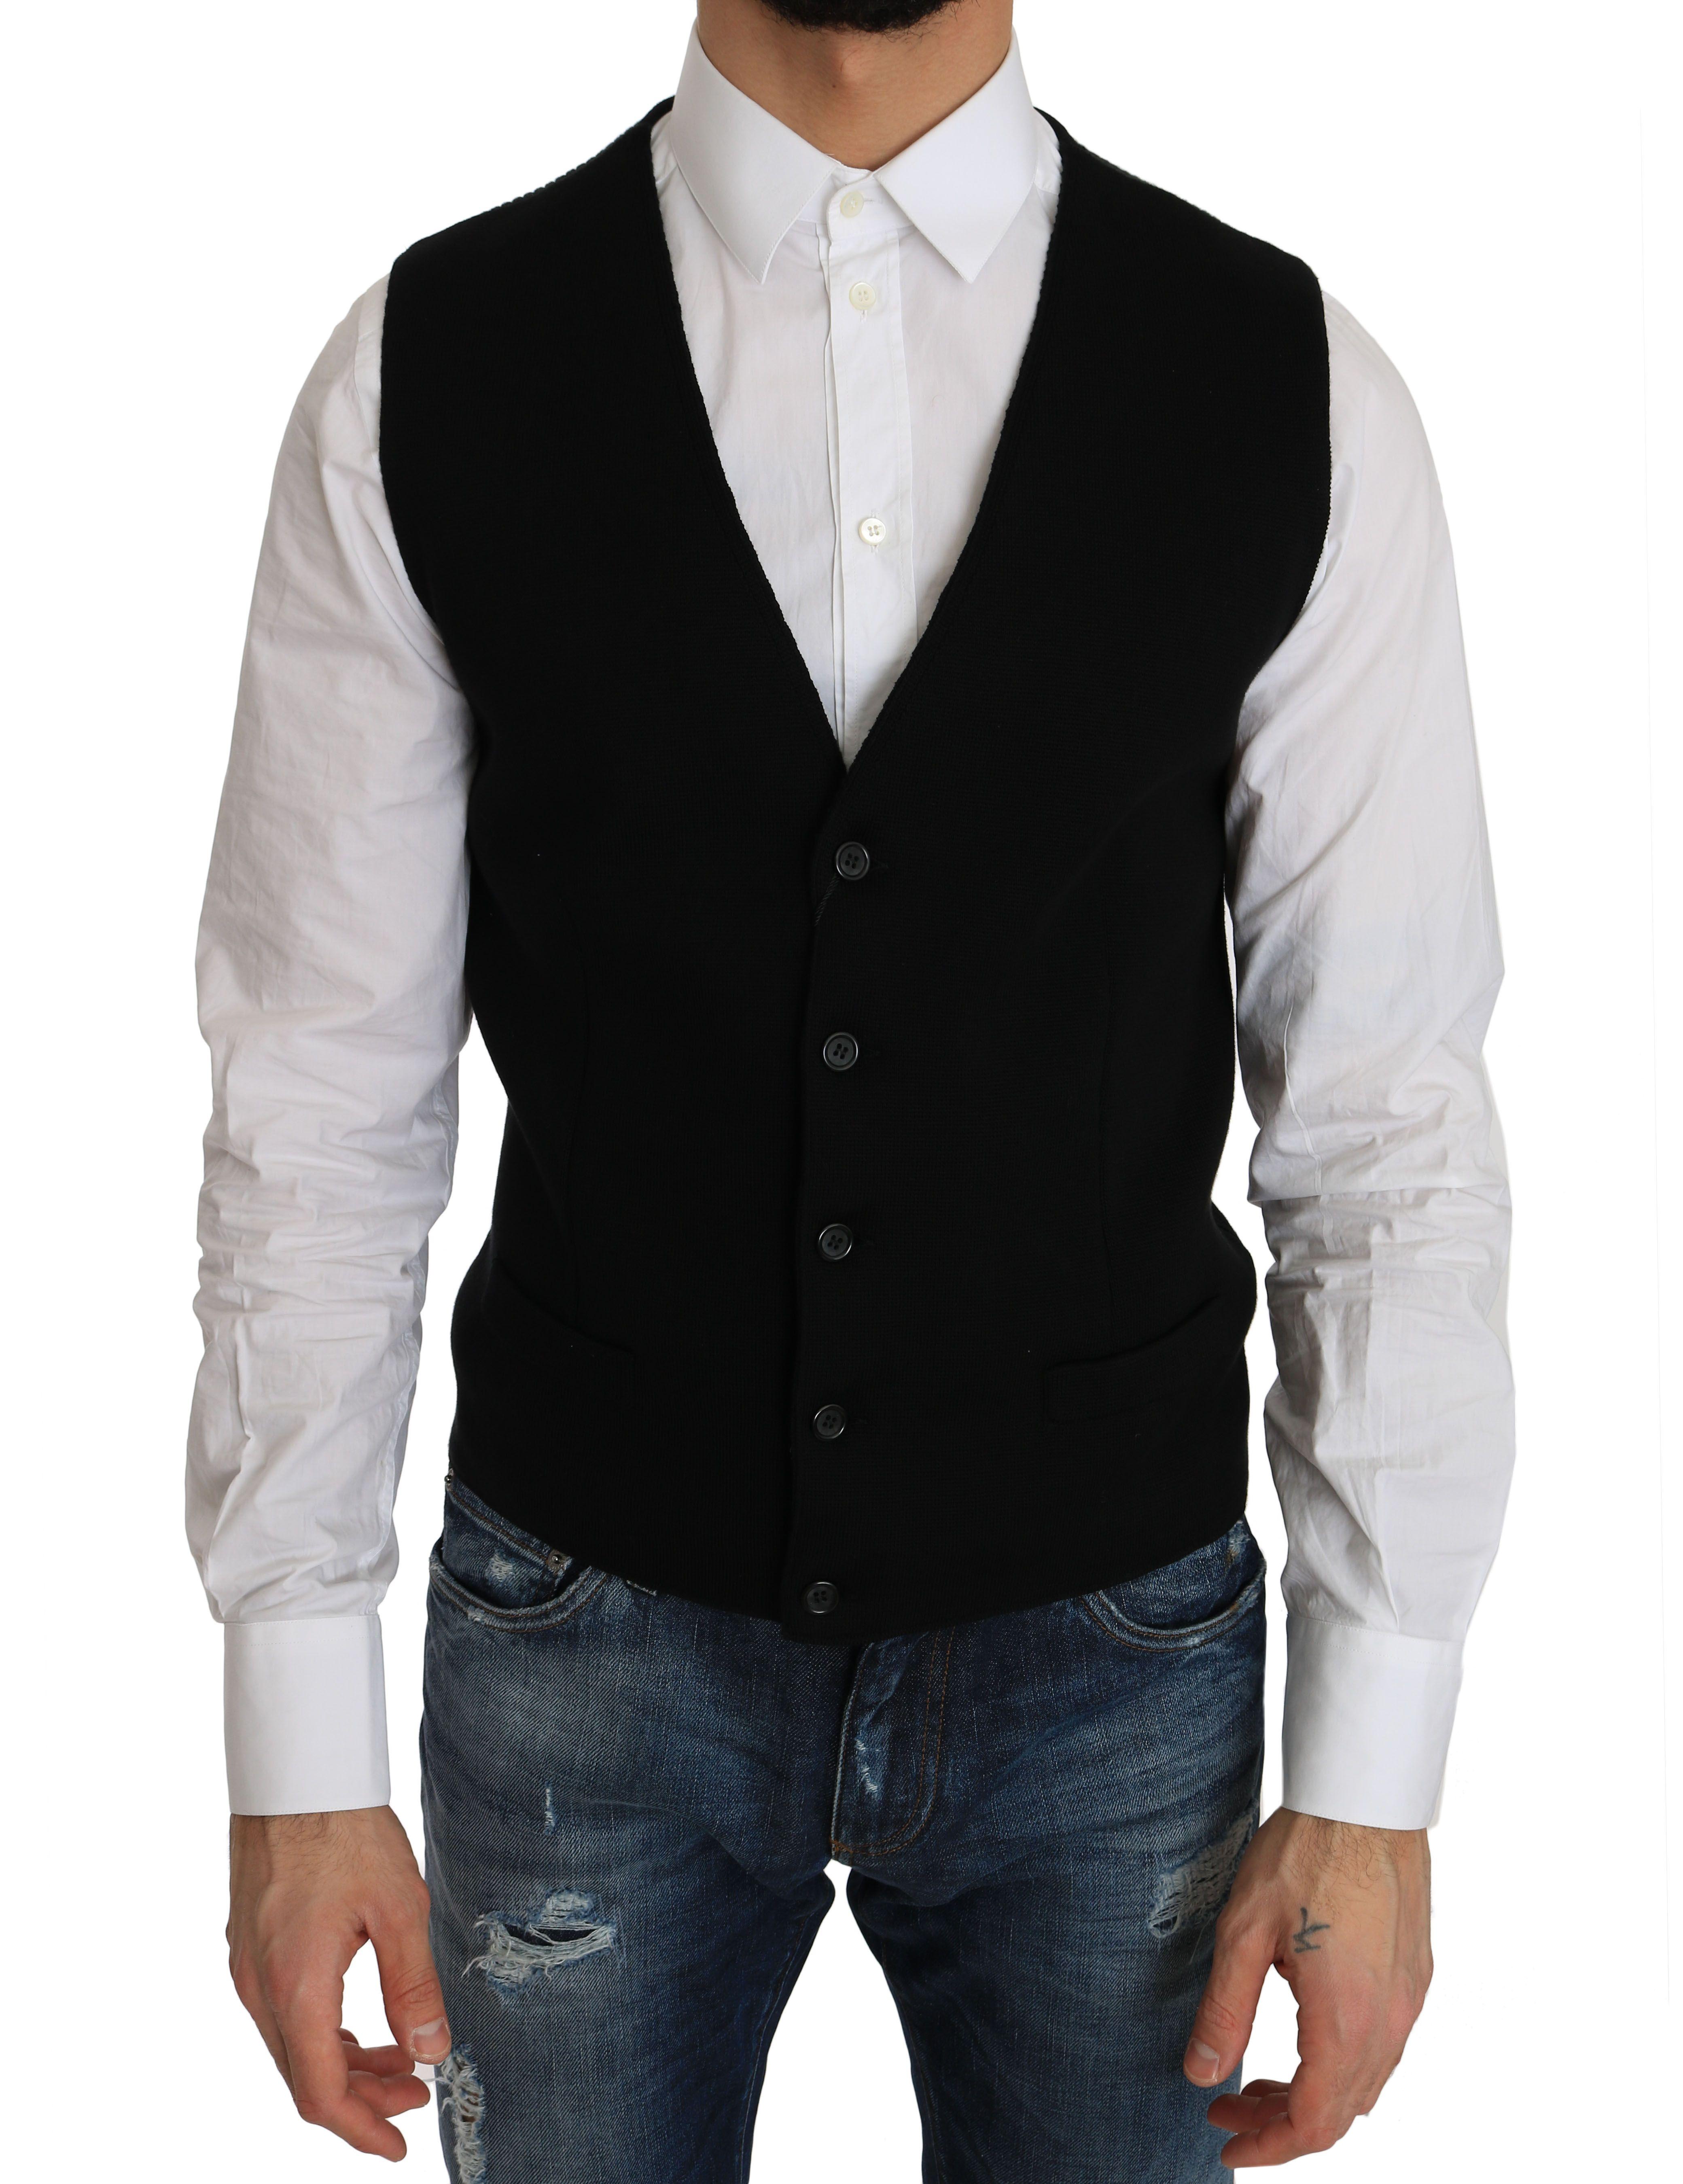 Dolce & Gabbana Black Cotton Dress Woven Waistcoat